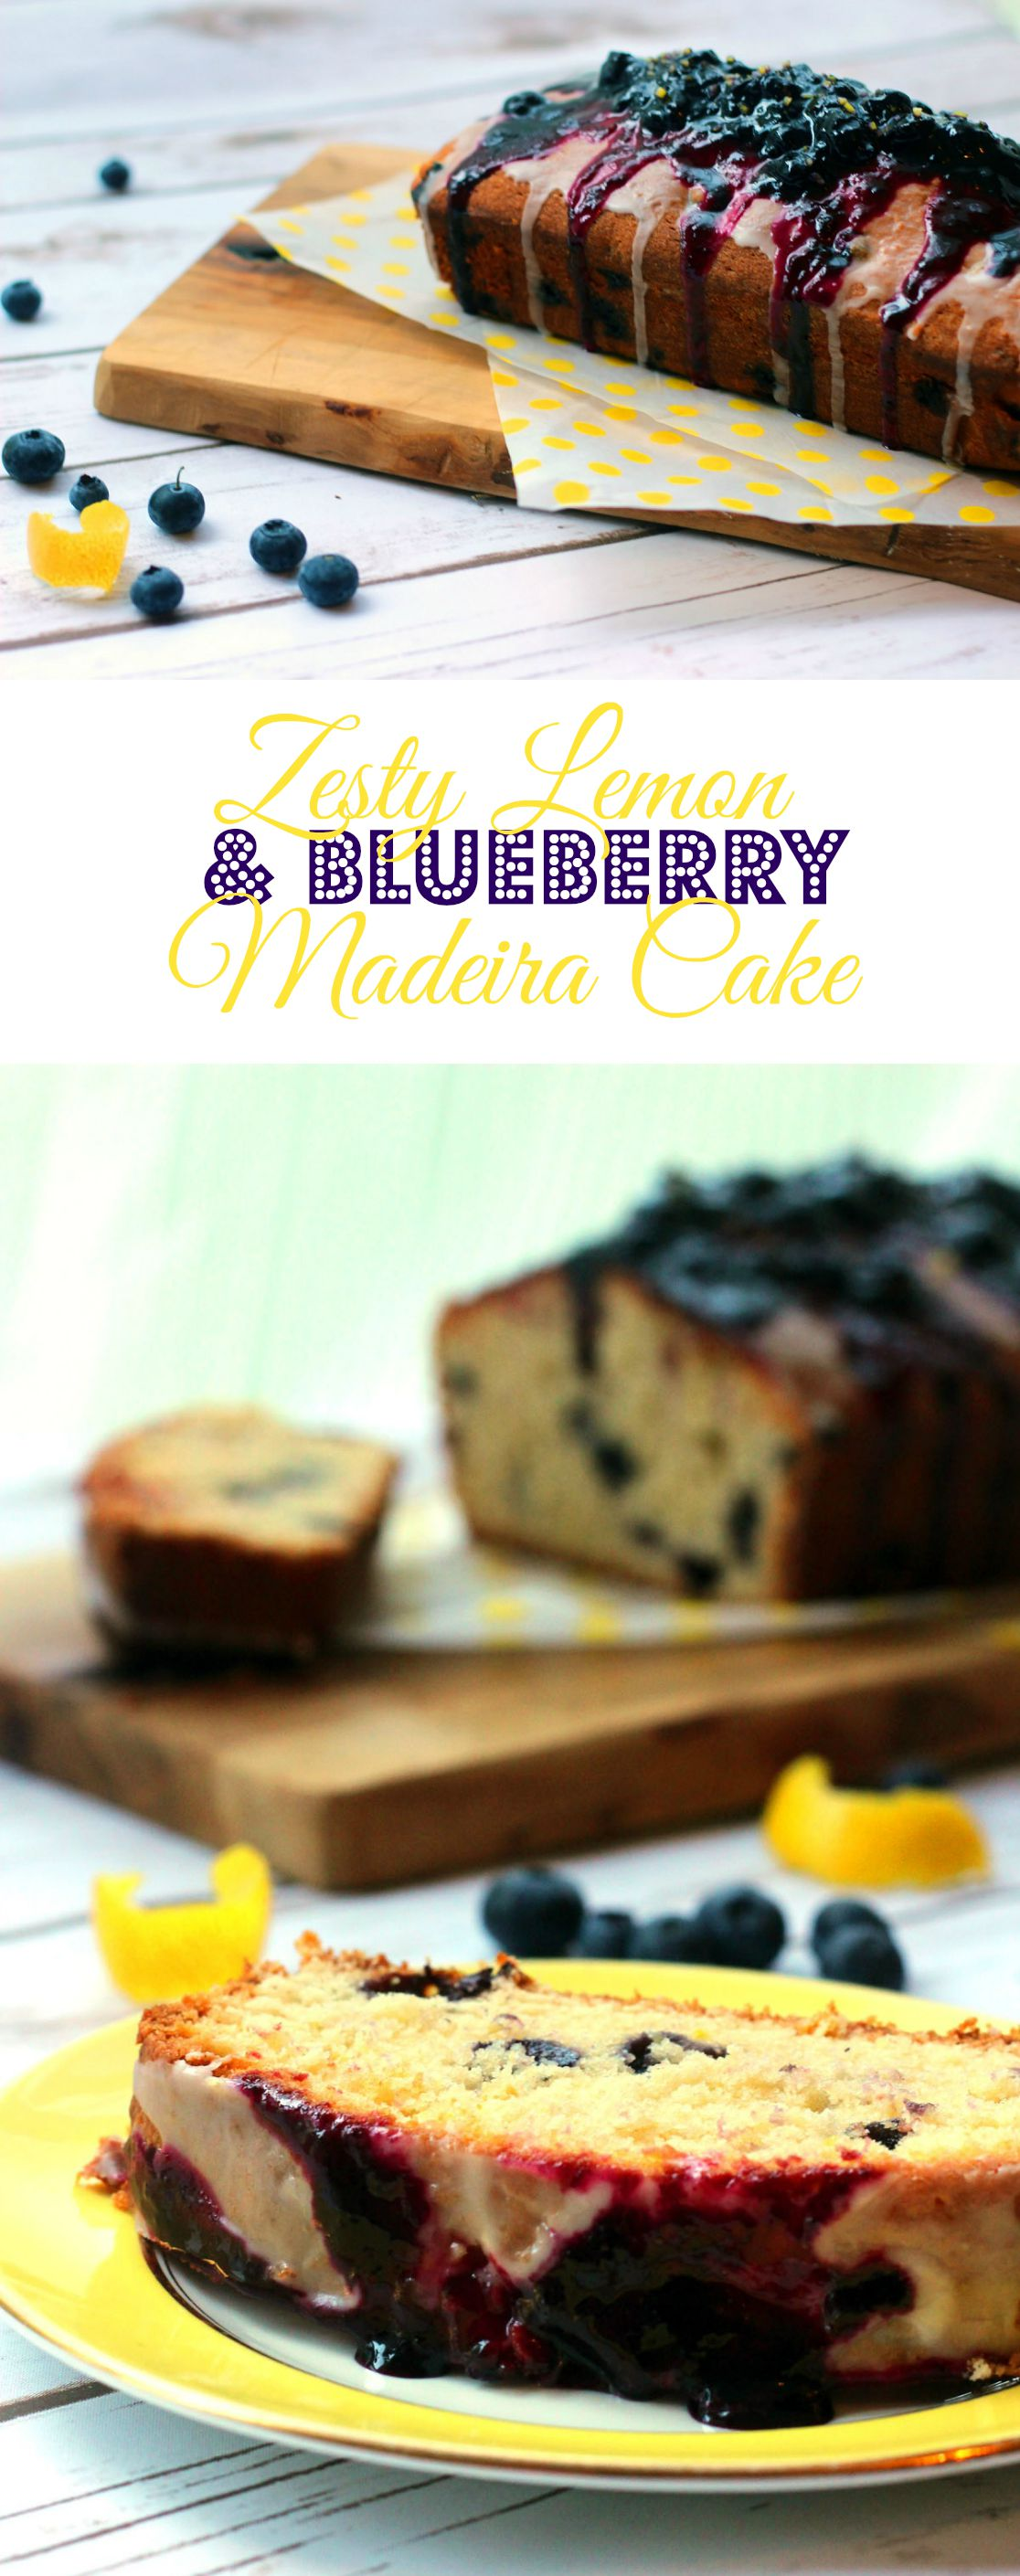 Madeira Cake Recipe Lemon